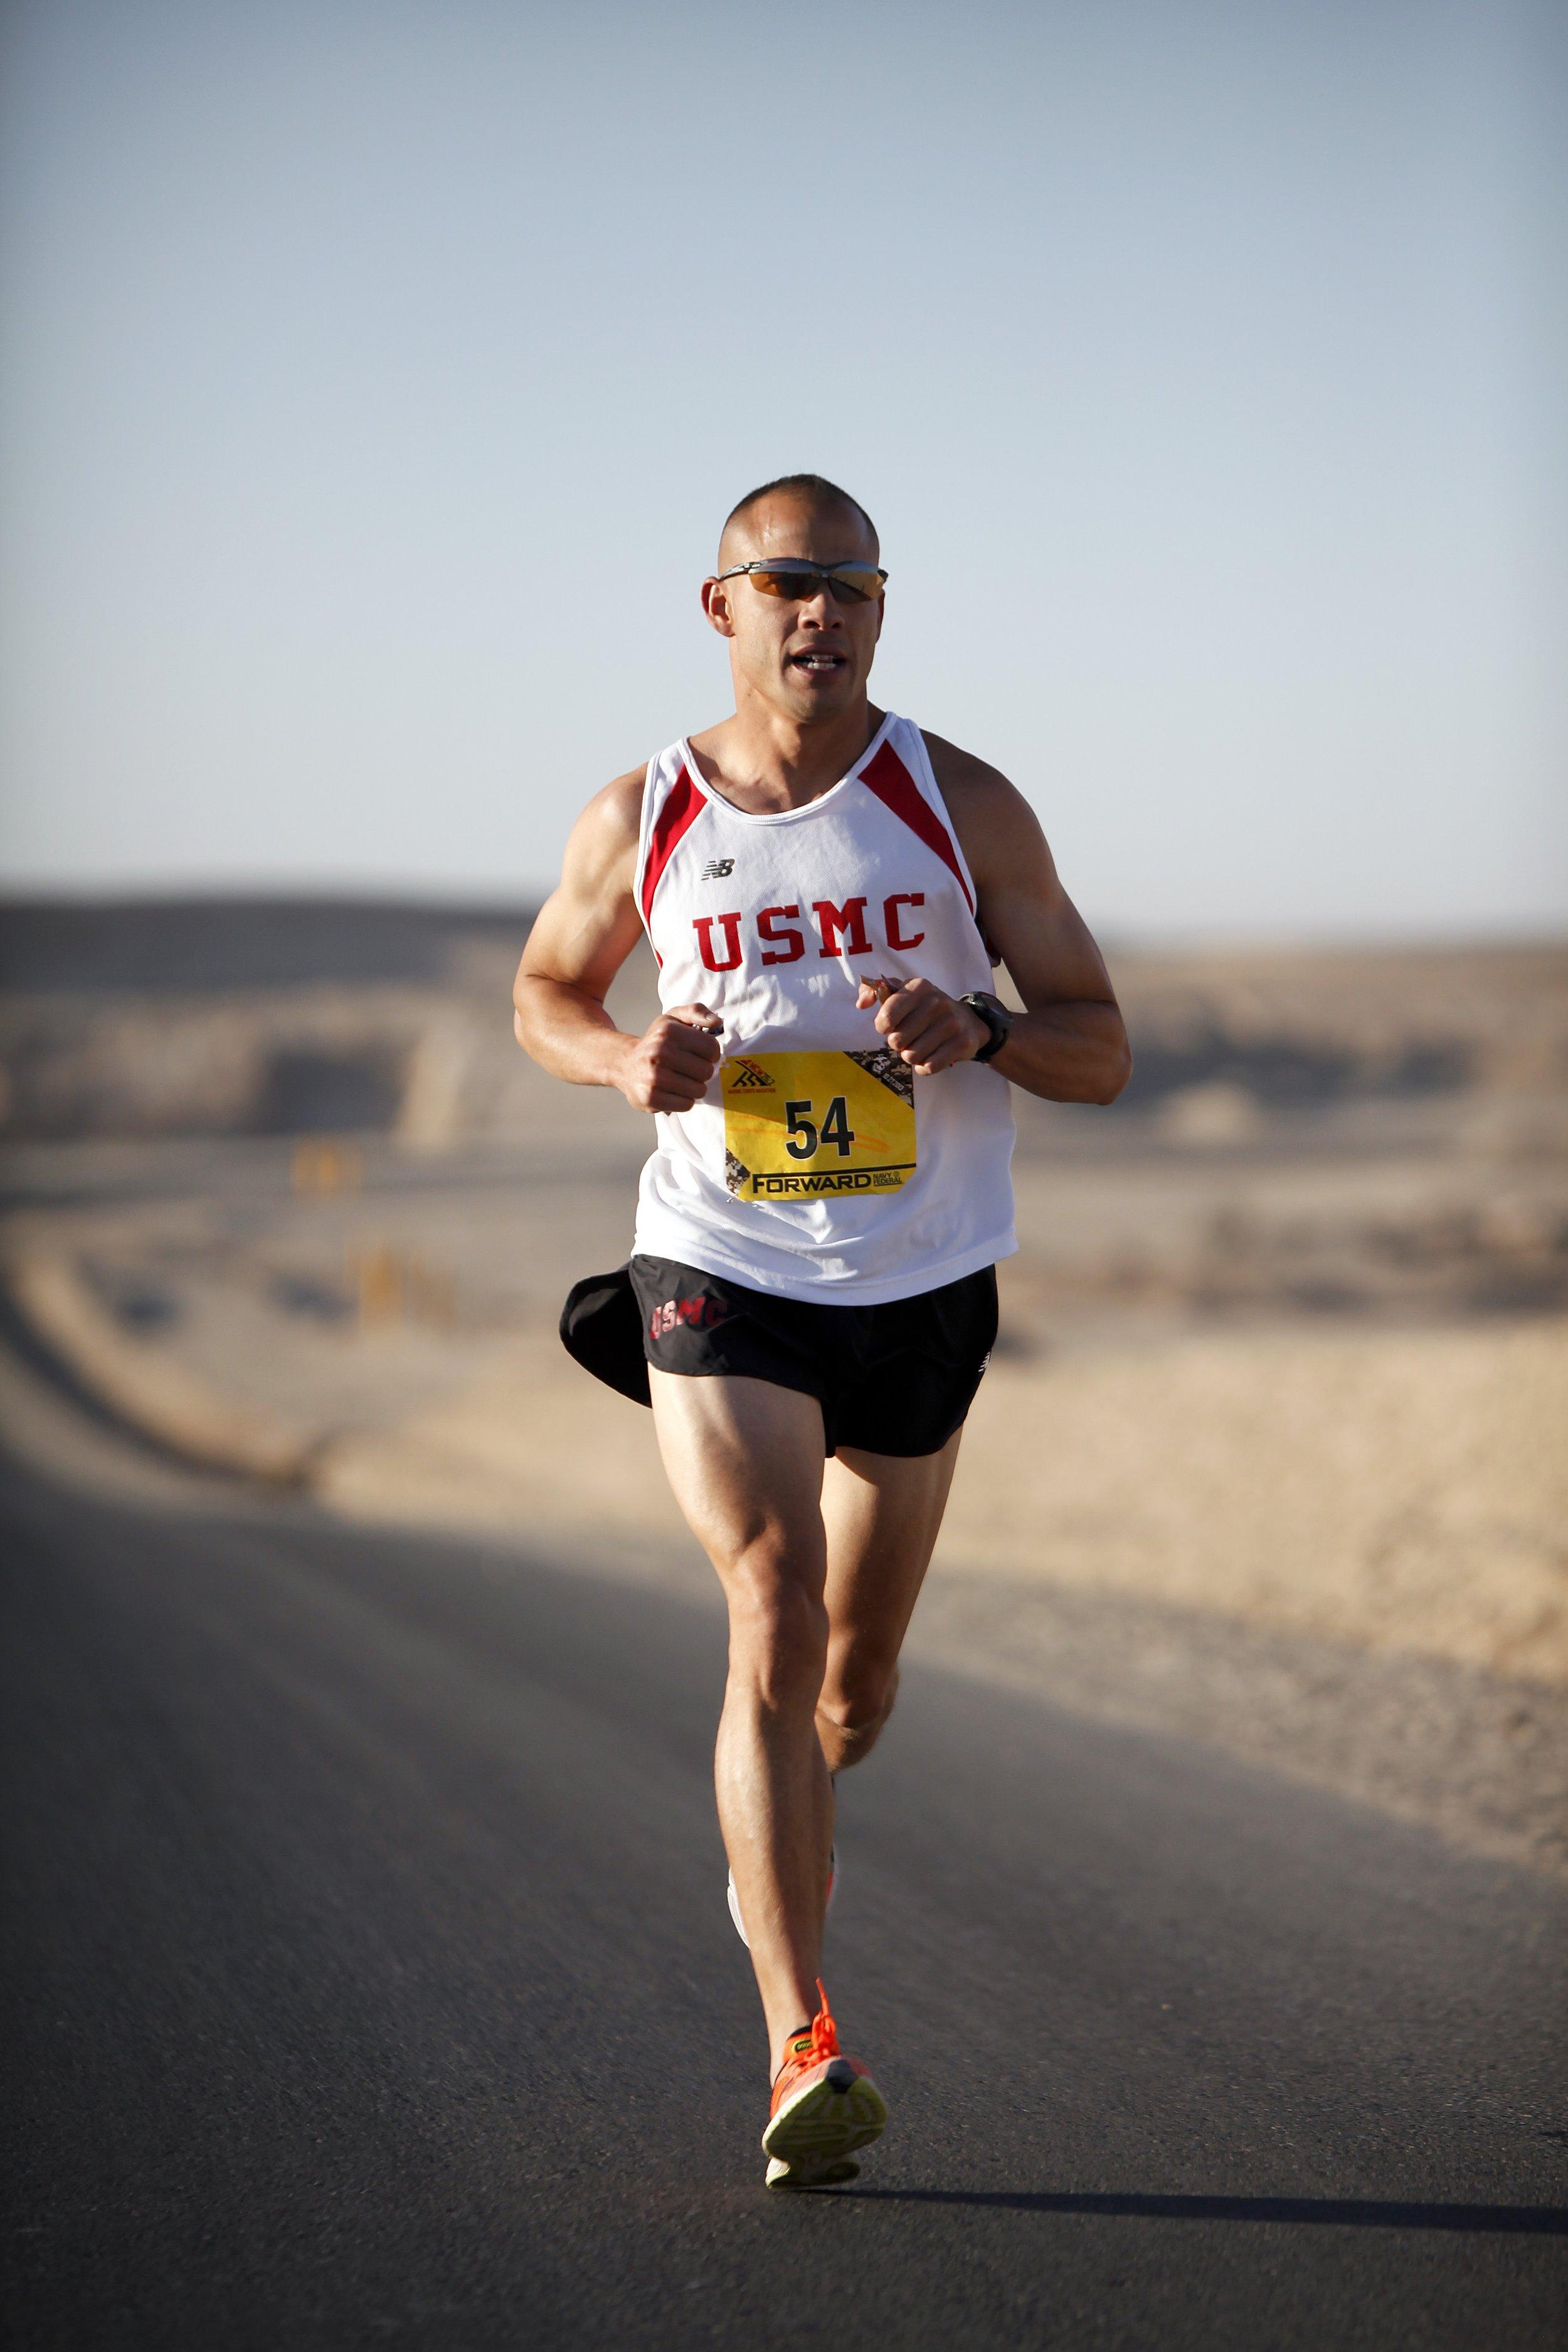 leg-knee-foot-alignment-running-injury